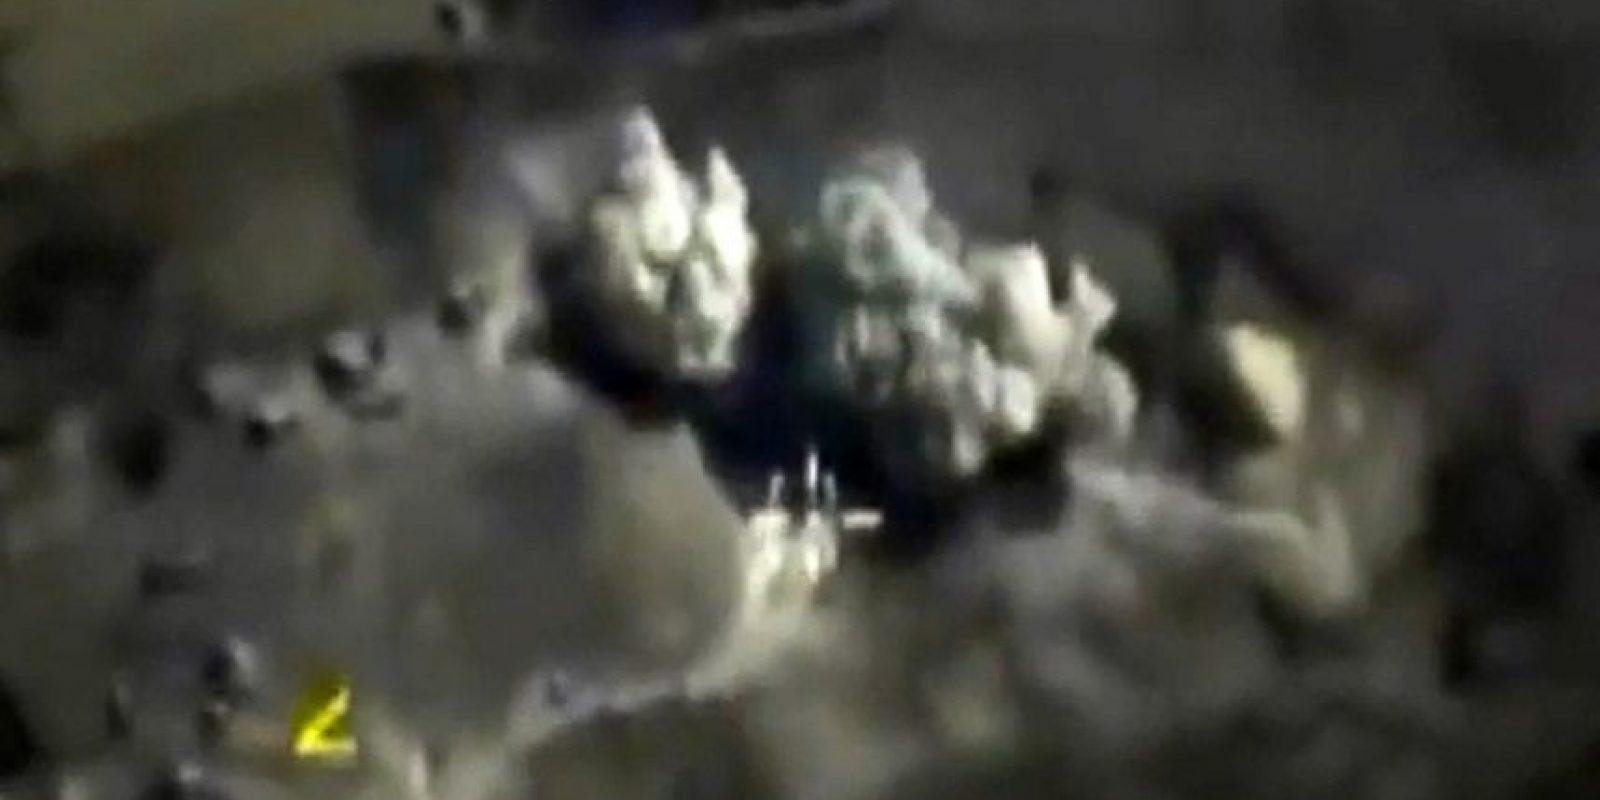 Rusia comenzó sus ataques aéreos en Siria hace una semana Foto:AFP